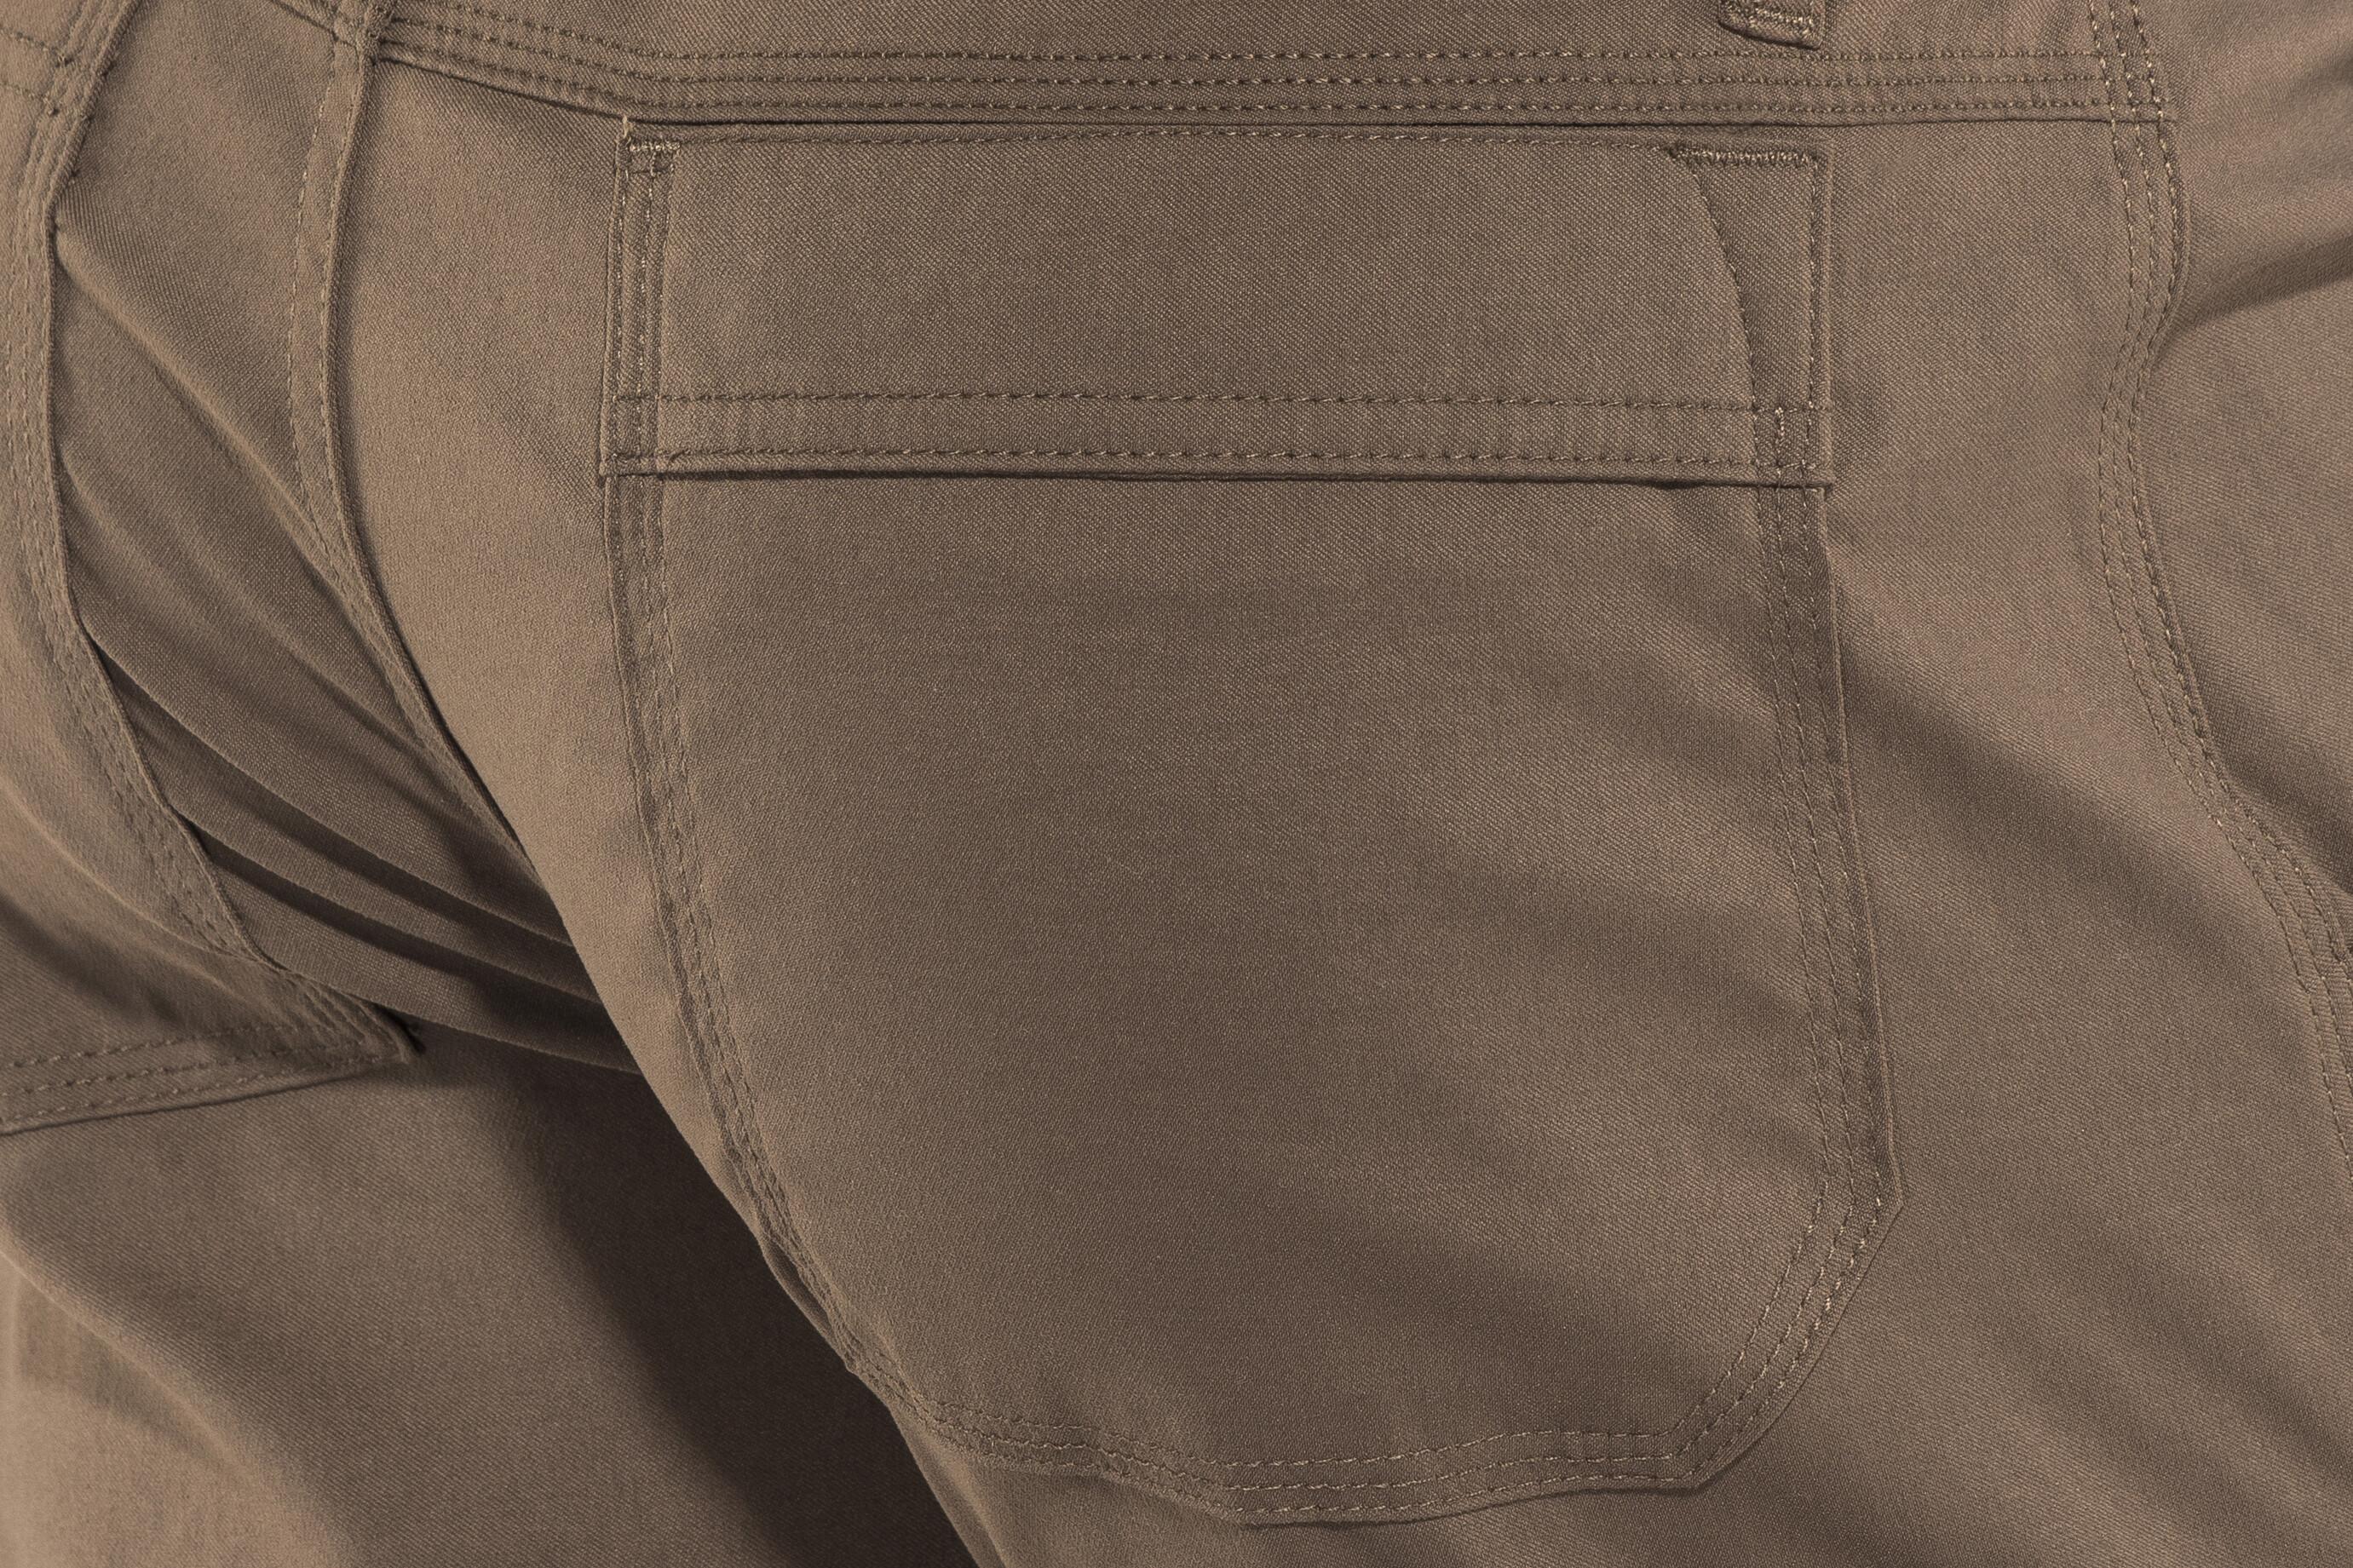 9d0348bfce0 Prana Stretch Zion Pants Men 32 brown at Addnature.co.uk